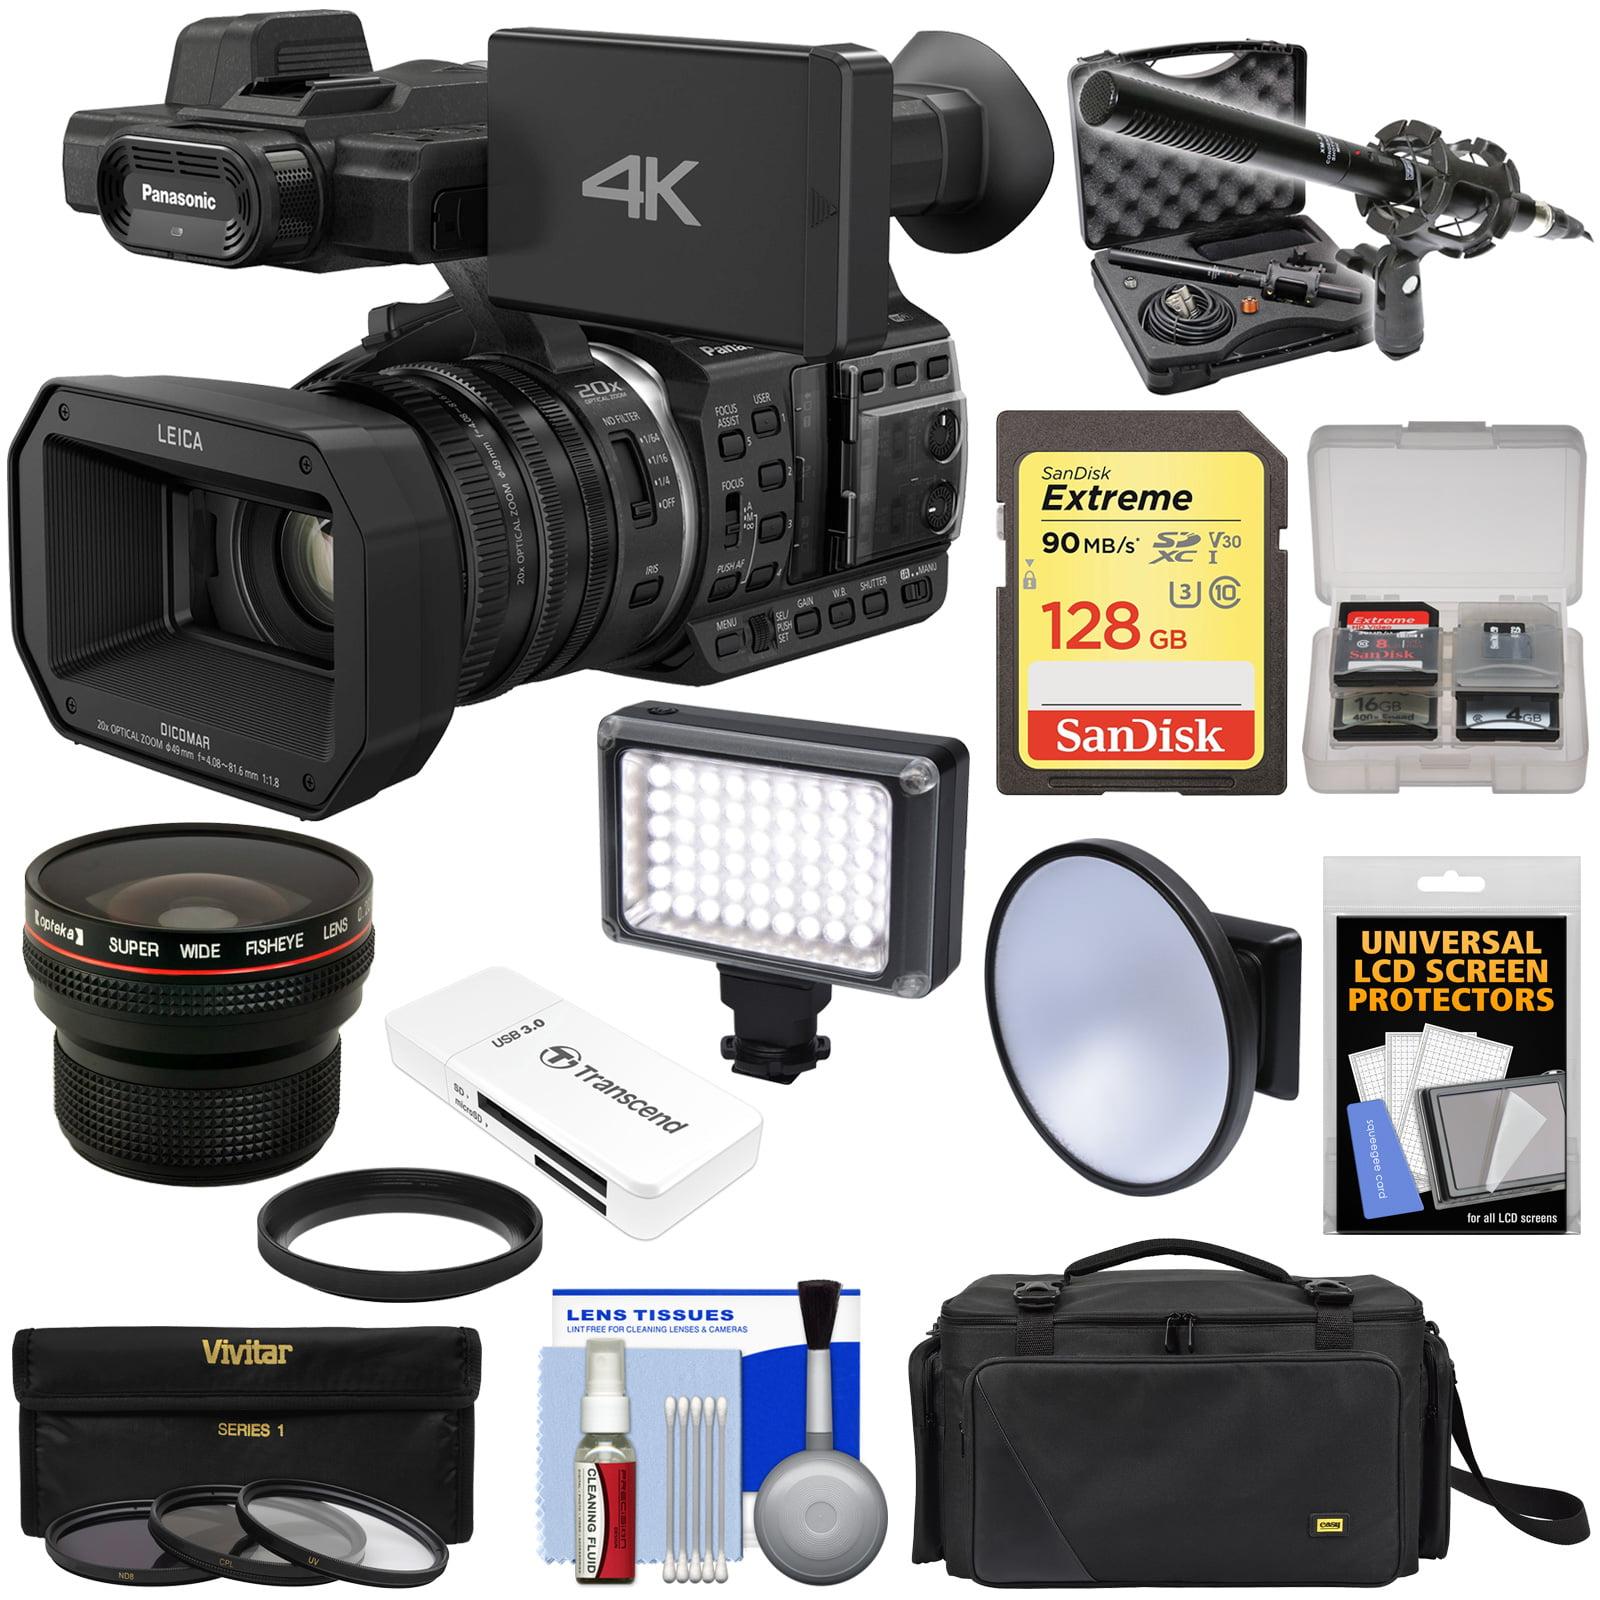 Panasonic HC-X1000 4K Ultra HD Wi-Fi Video Camera Camcorder with Fisheye Lens + 128GB Card + Case + LED Light... by Panasonic